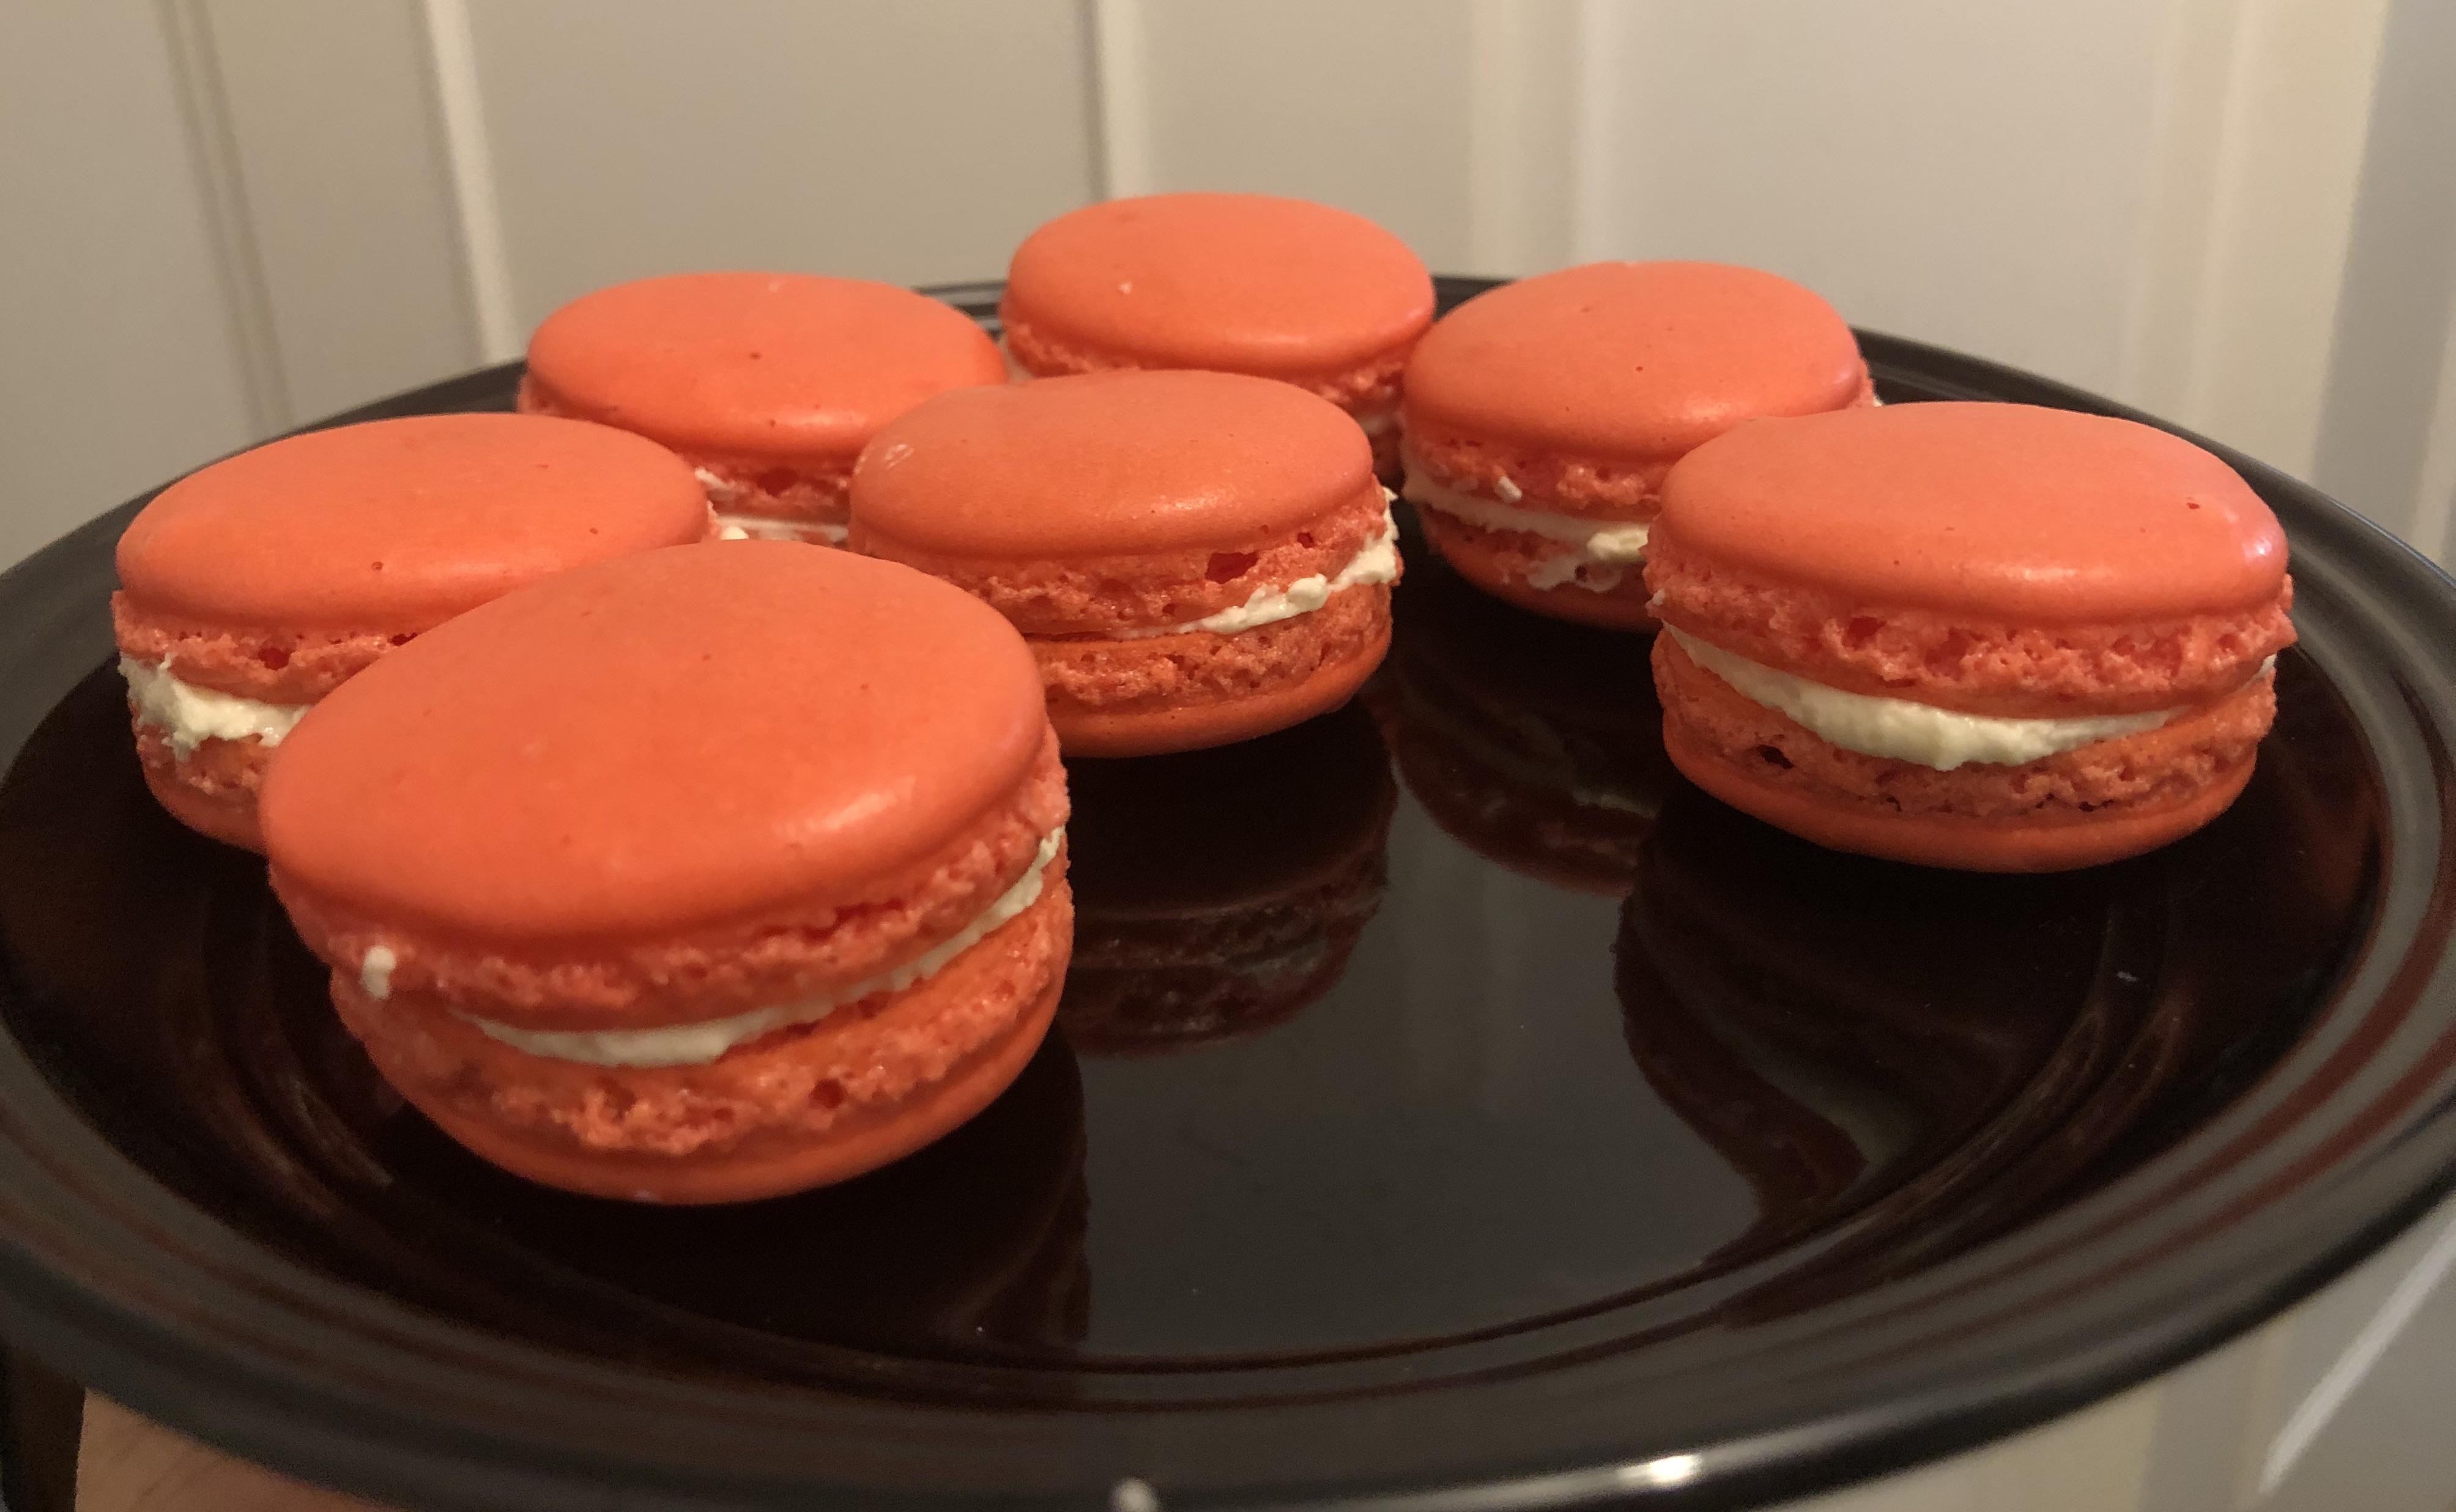 Finally, Macarons!